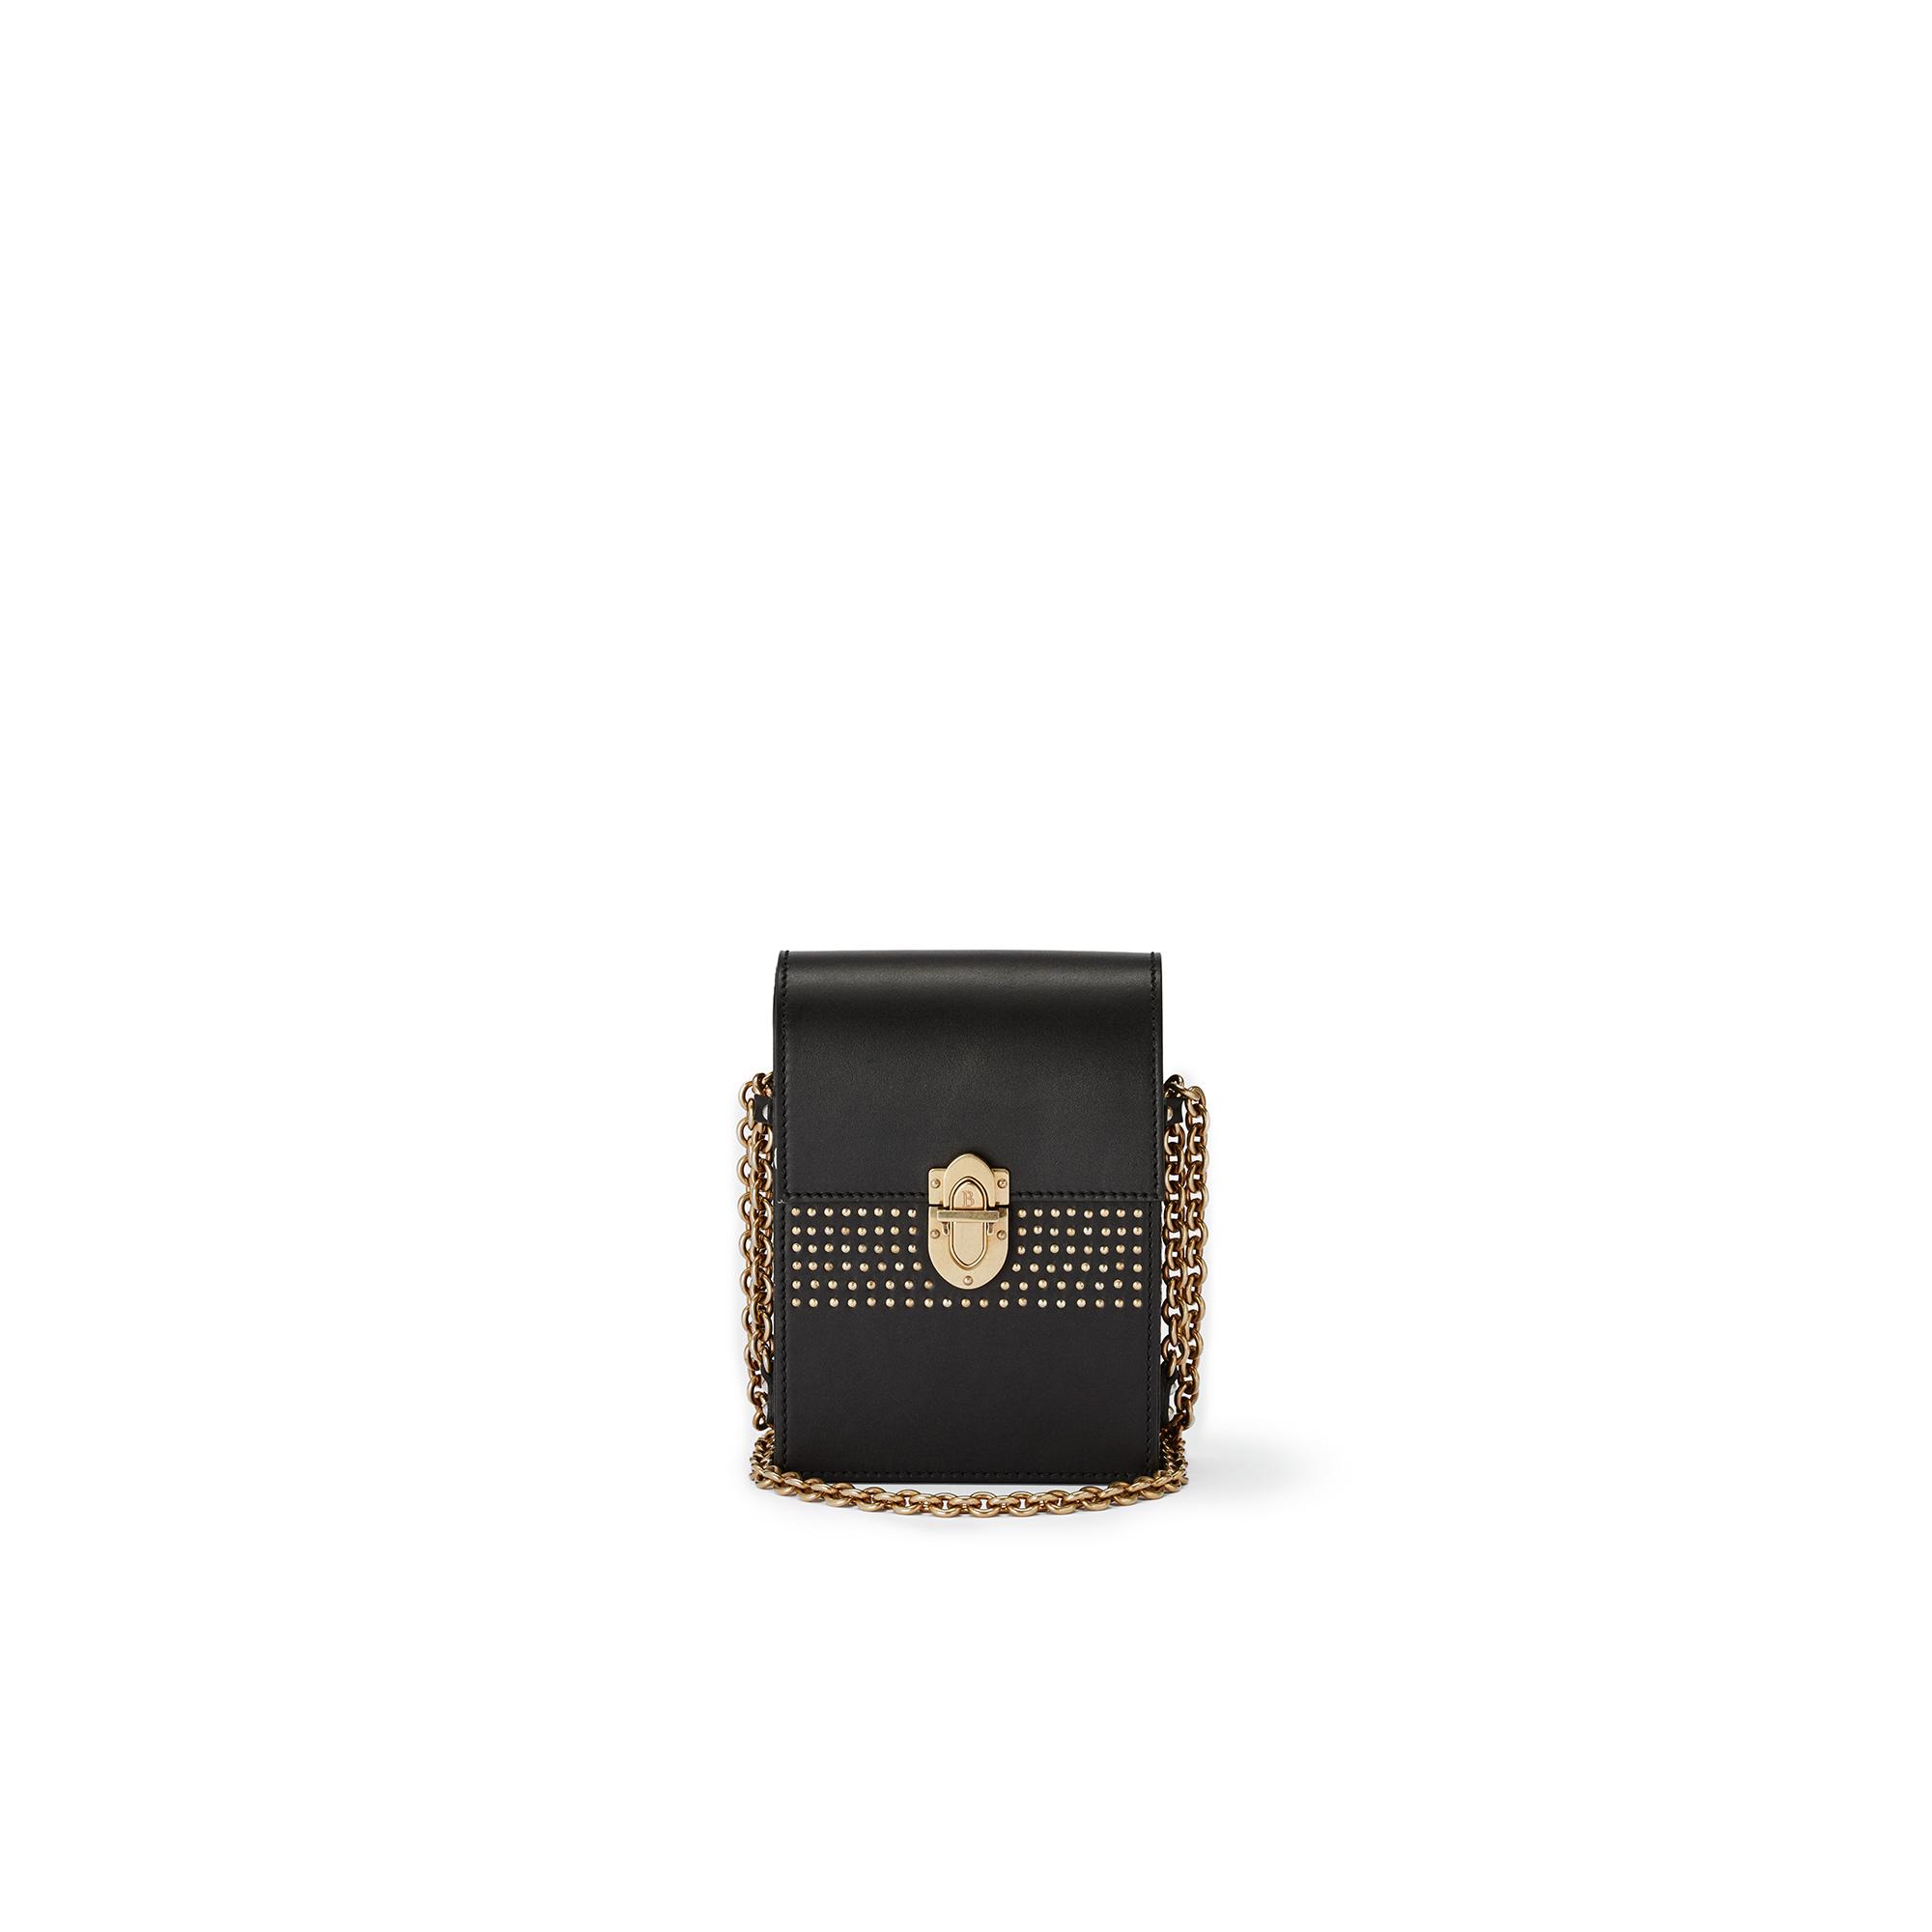 Mini-Gigi-black-french-calf-bag-Bertoni-1949